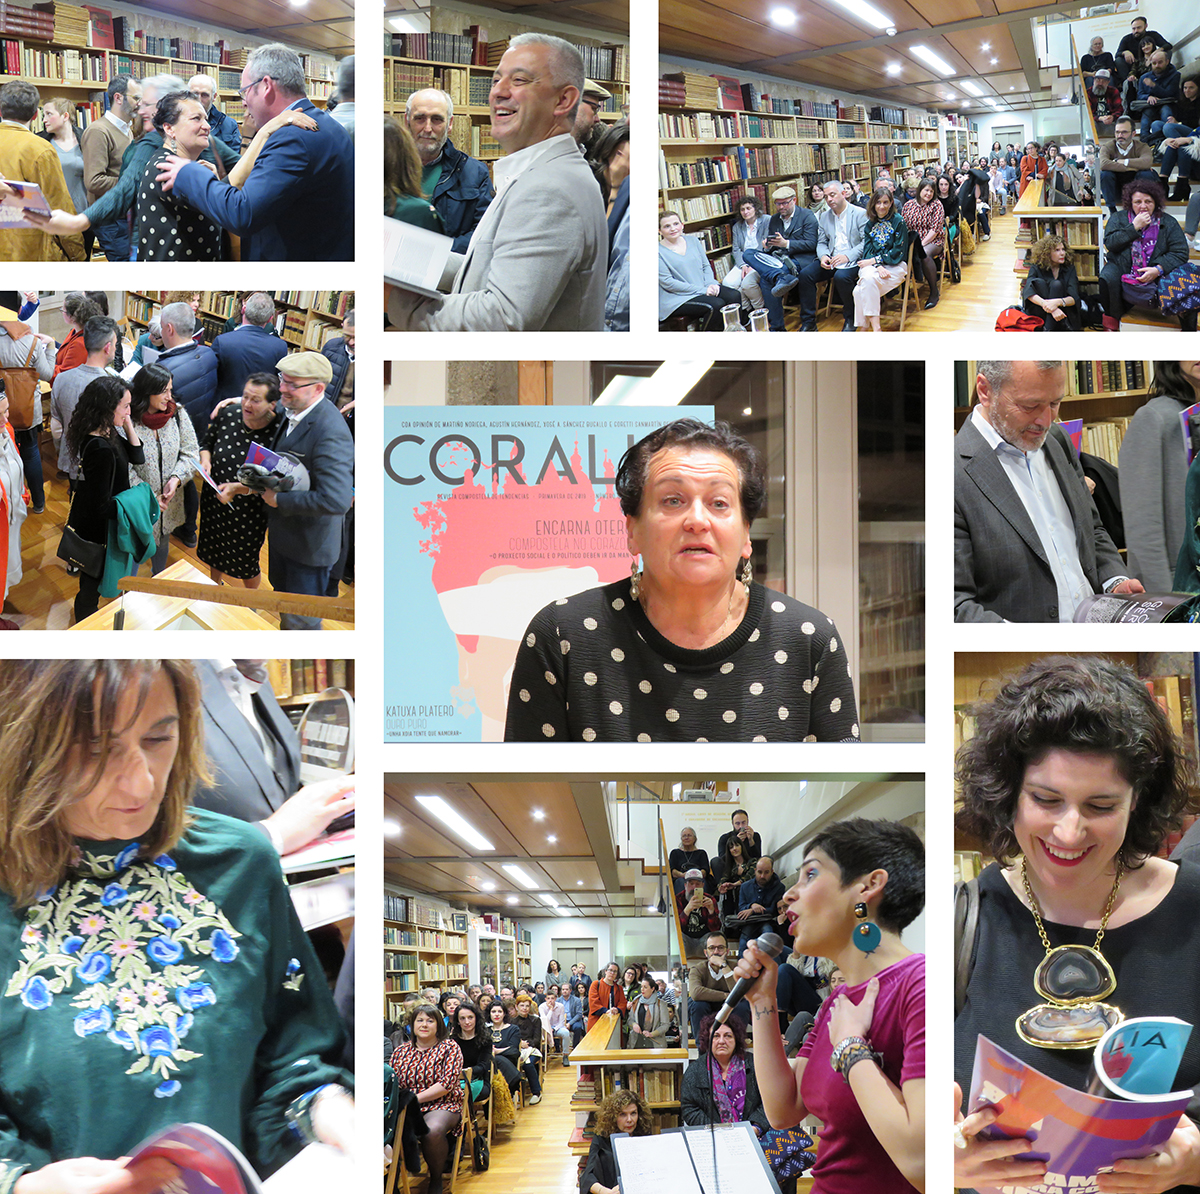 Coralia na libraria Couceiro